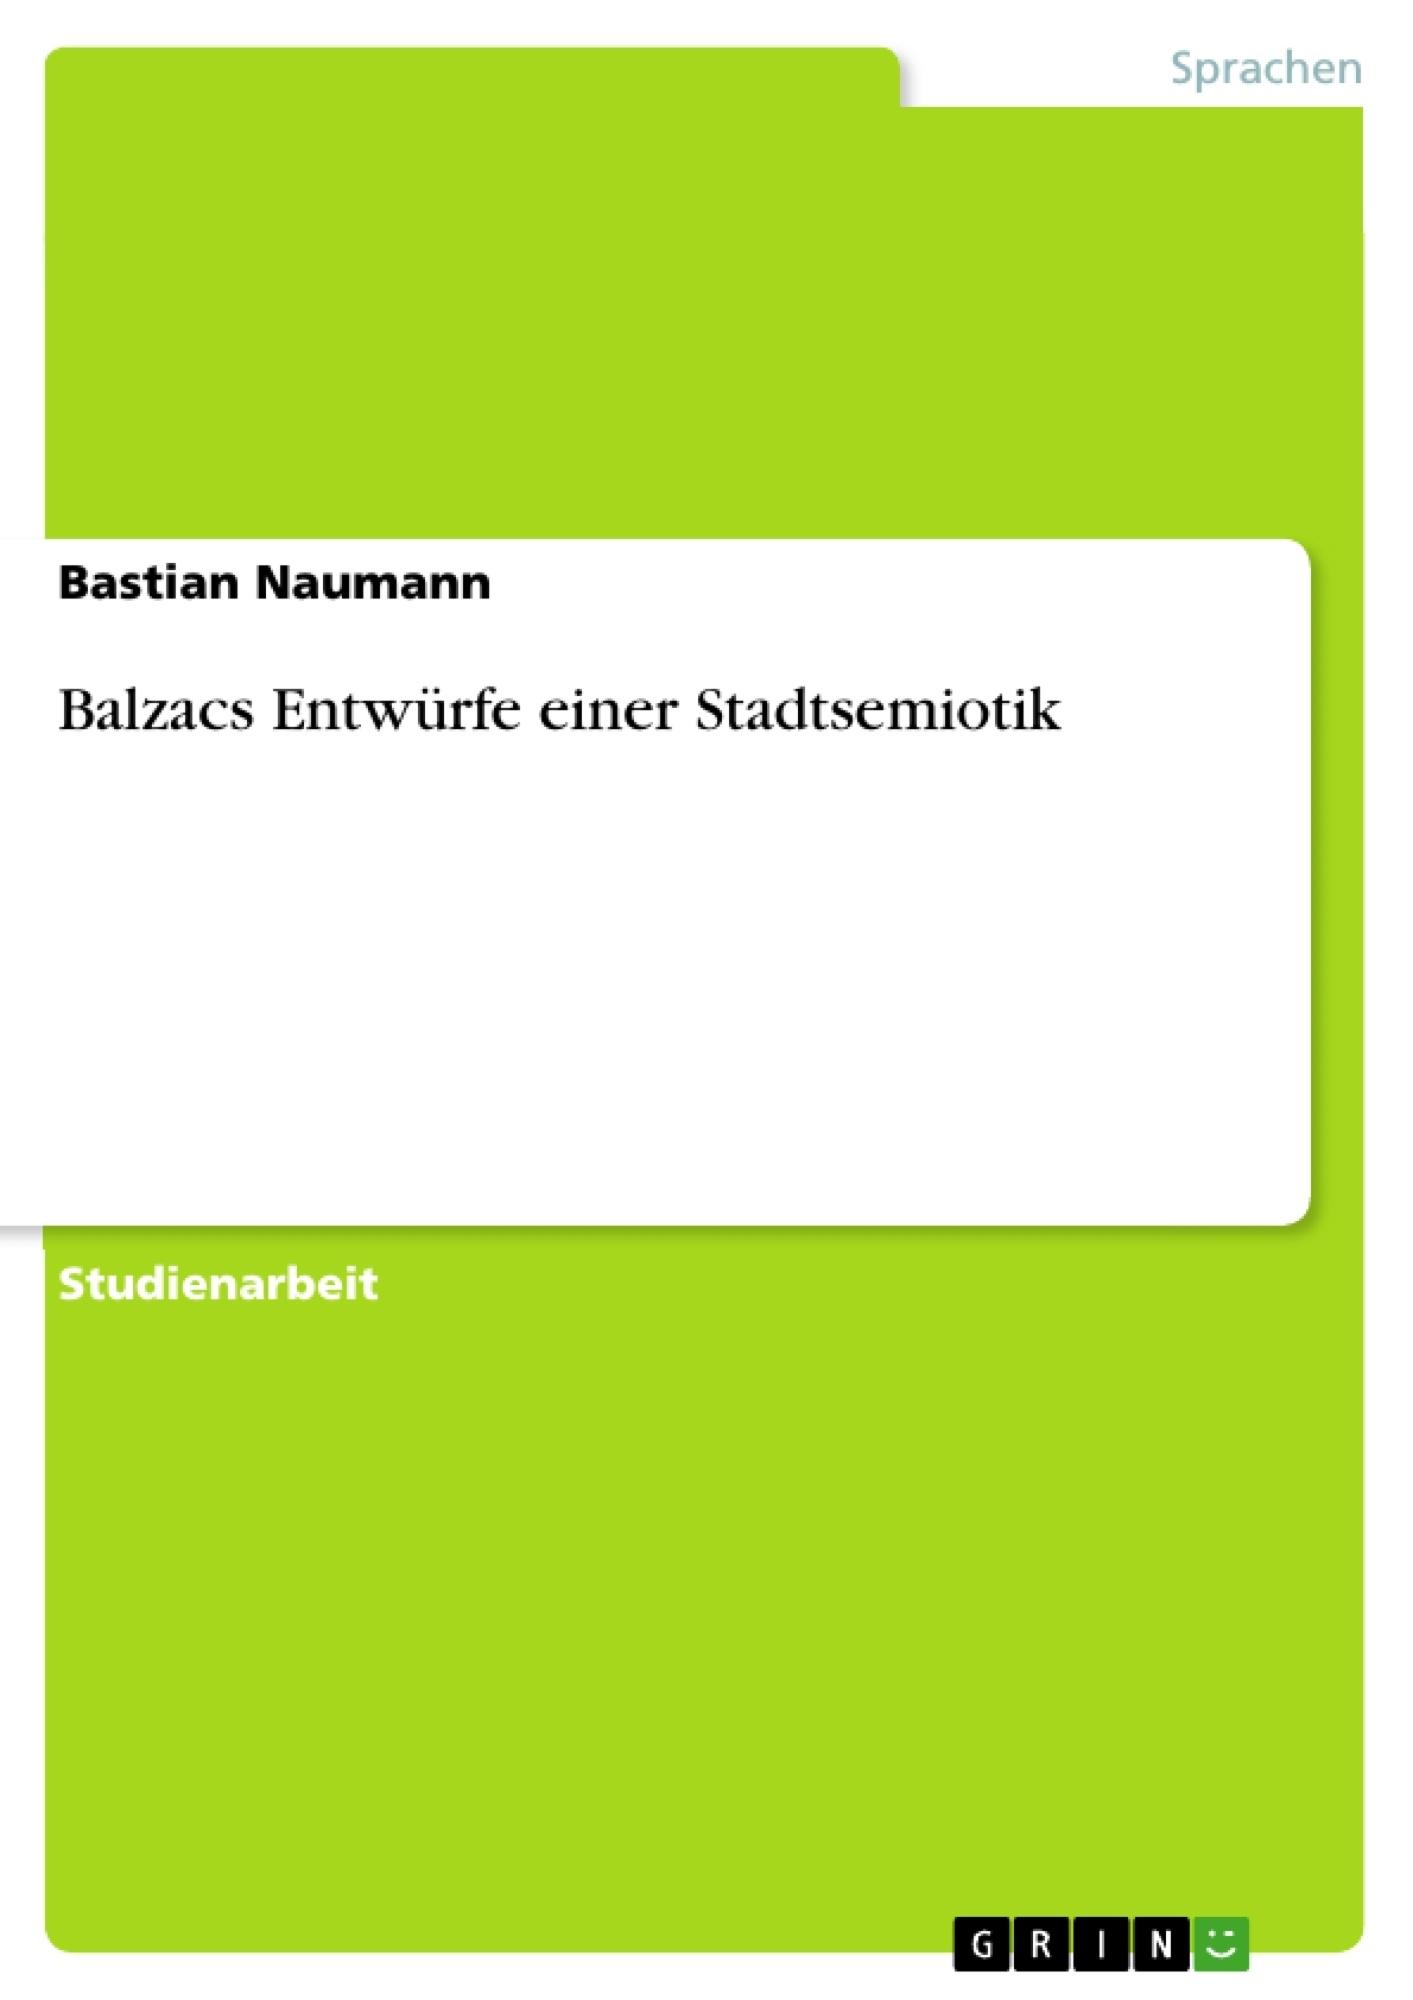 Titel: Balzacs Entwürfe einer Stadtsemiotik